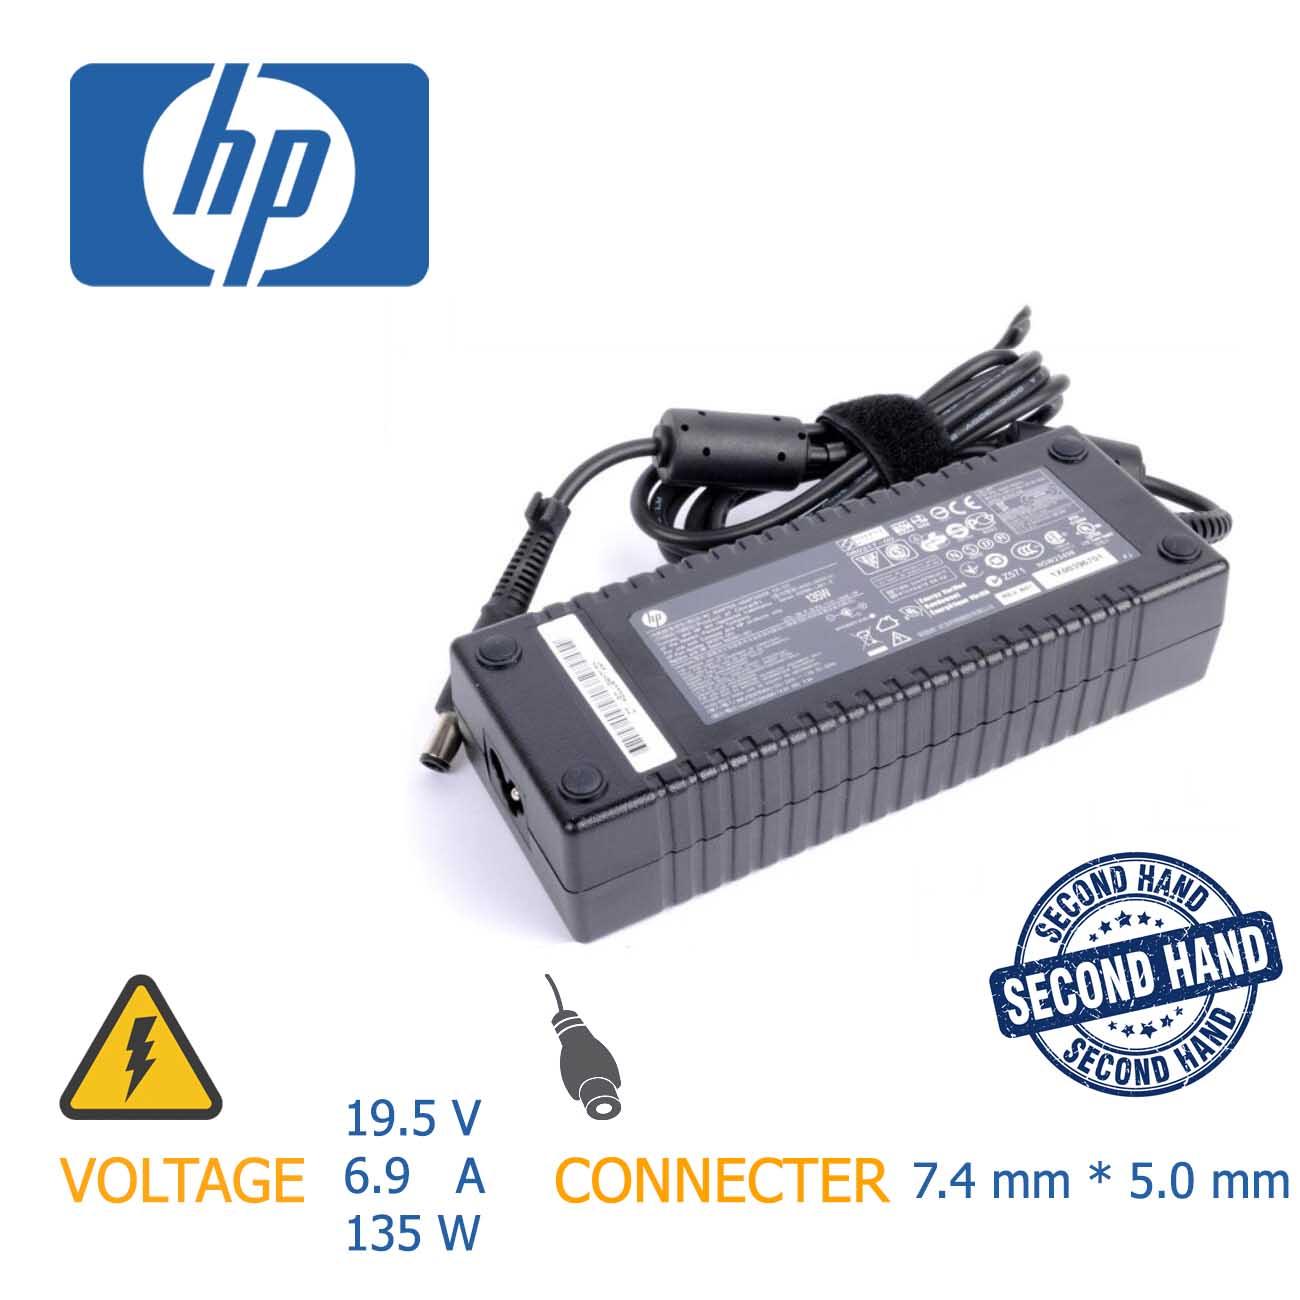 شارژر-آداپتور-لپ تاپ-نوت بوک HP